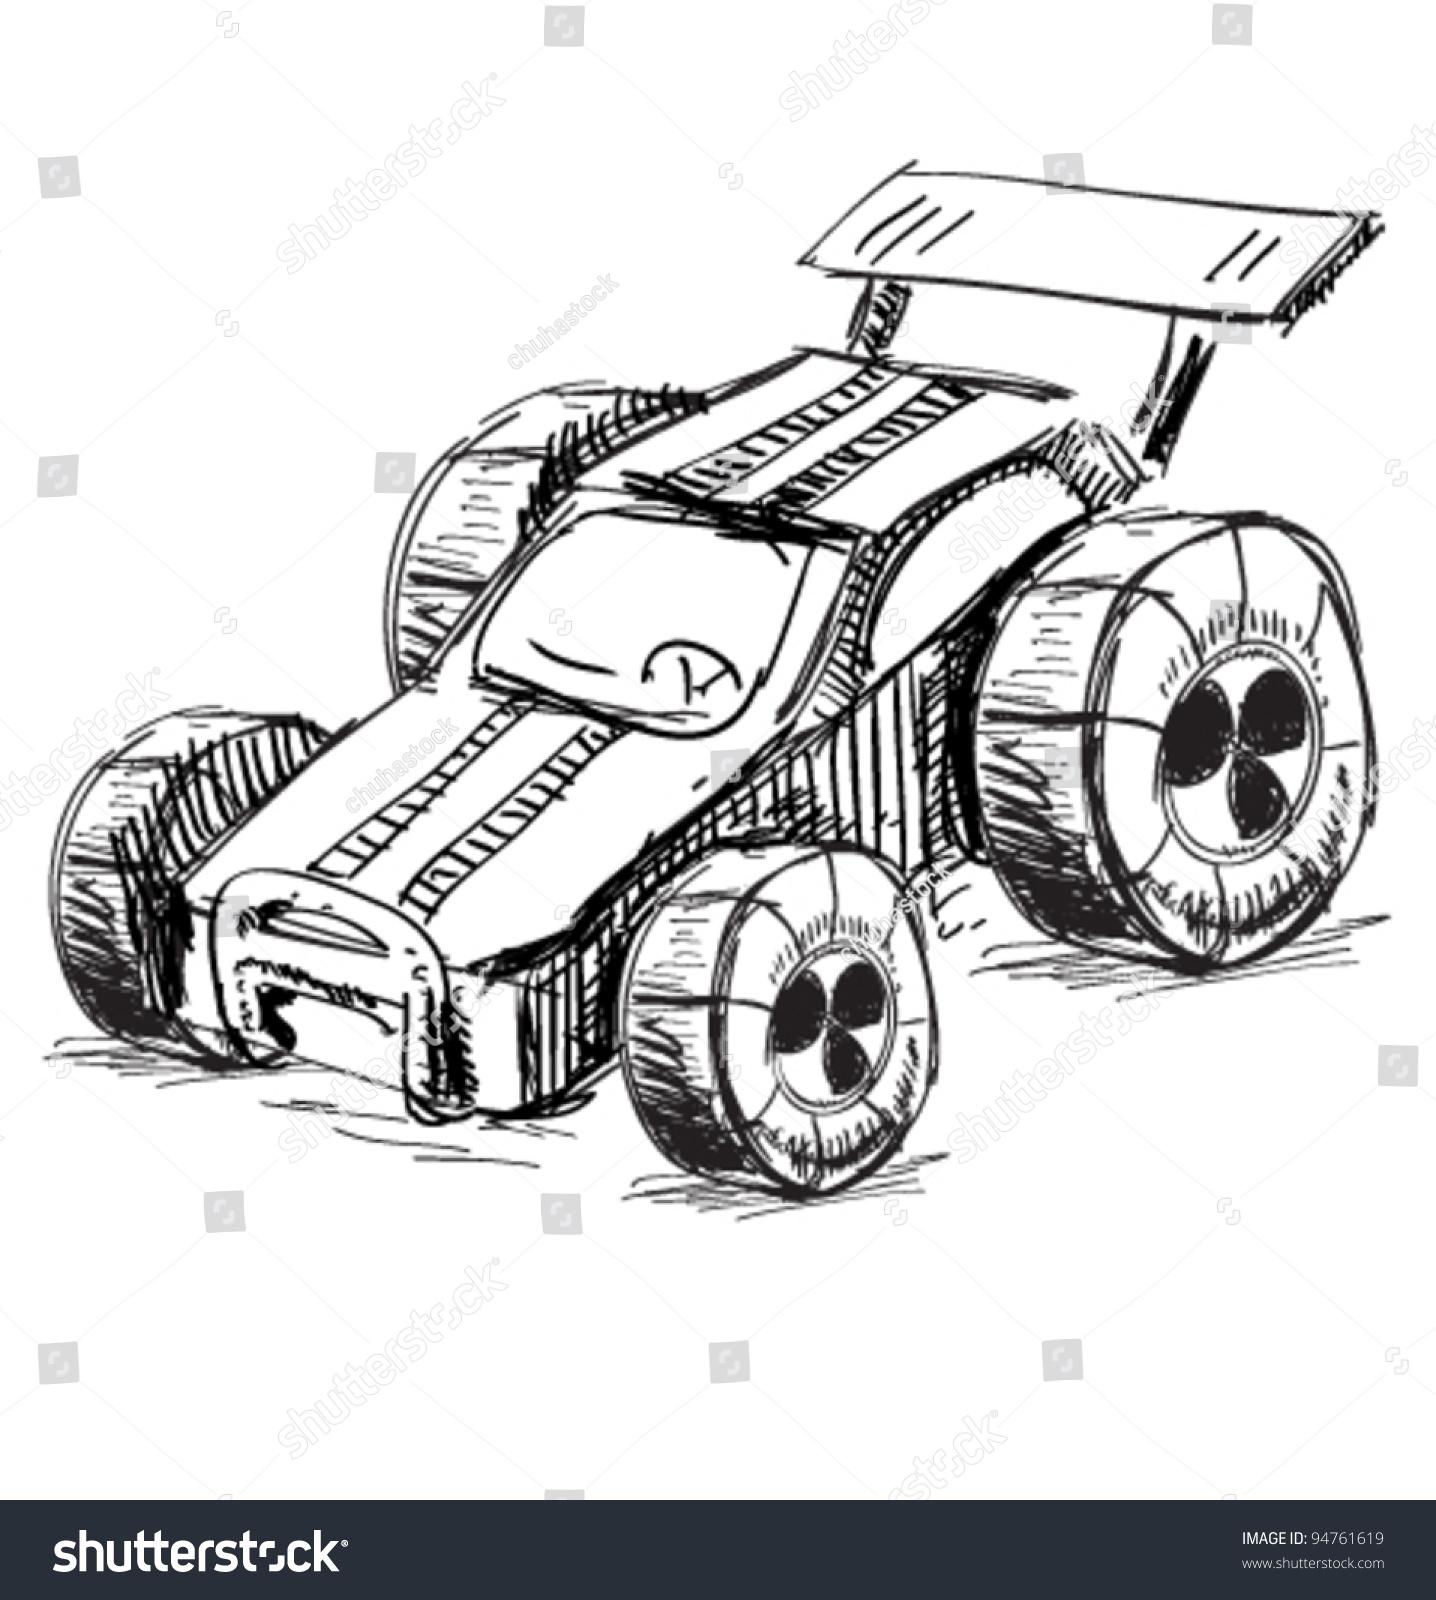 Race Car Sketch Vector Illustration Stock Vector 94761619 - Shutterstock